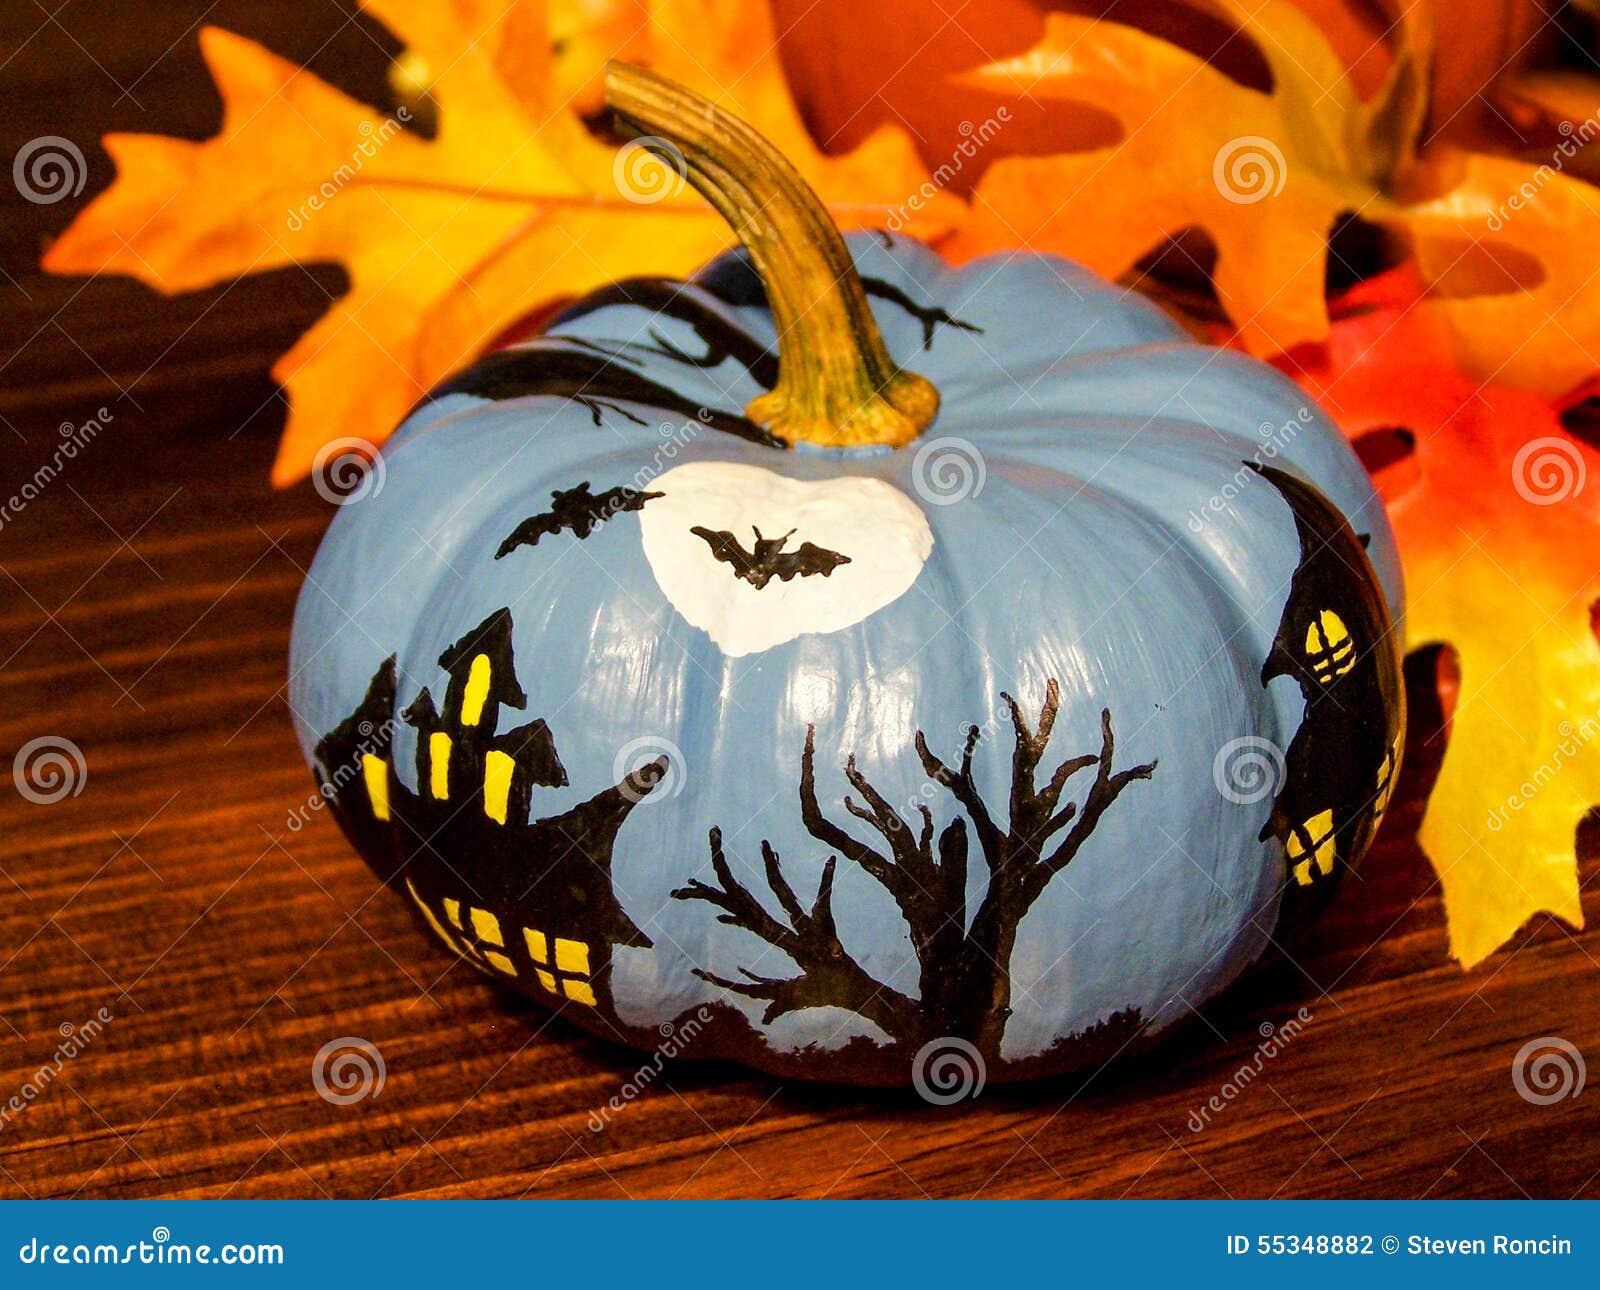 Halloween Painted Pumpkins Part - 41: Dreamstime.com